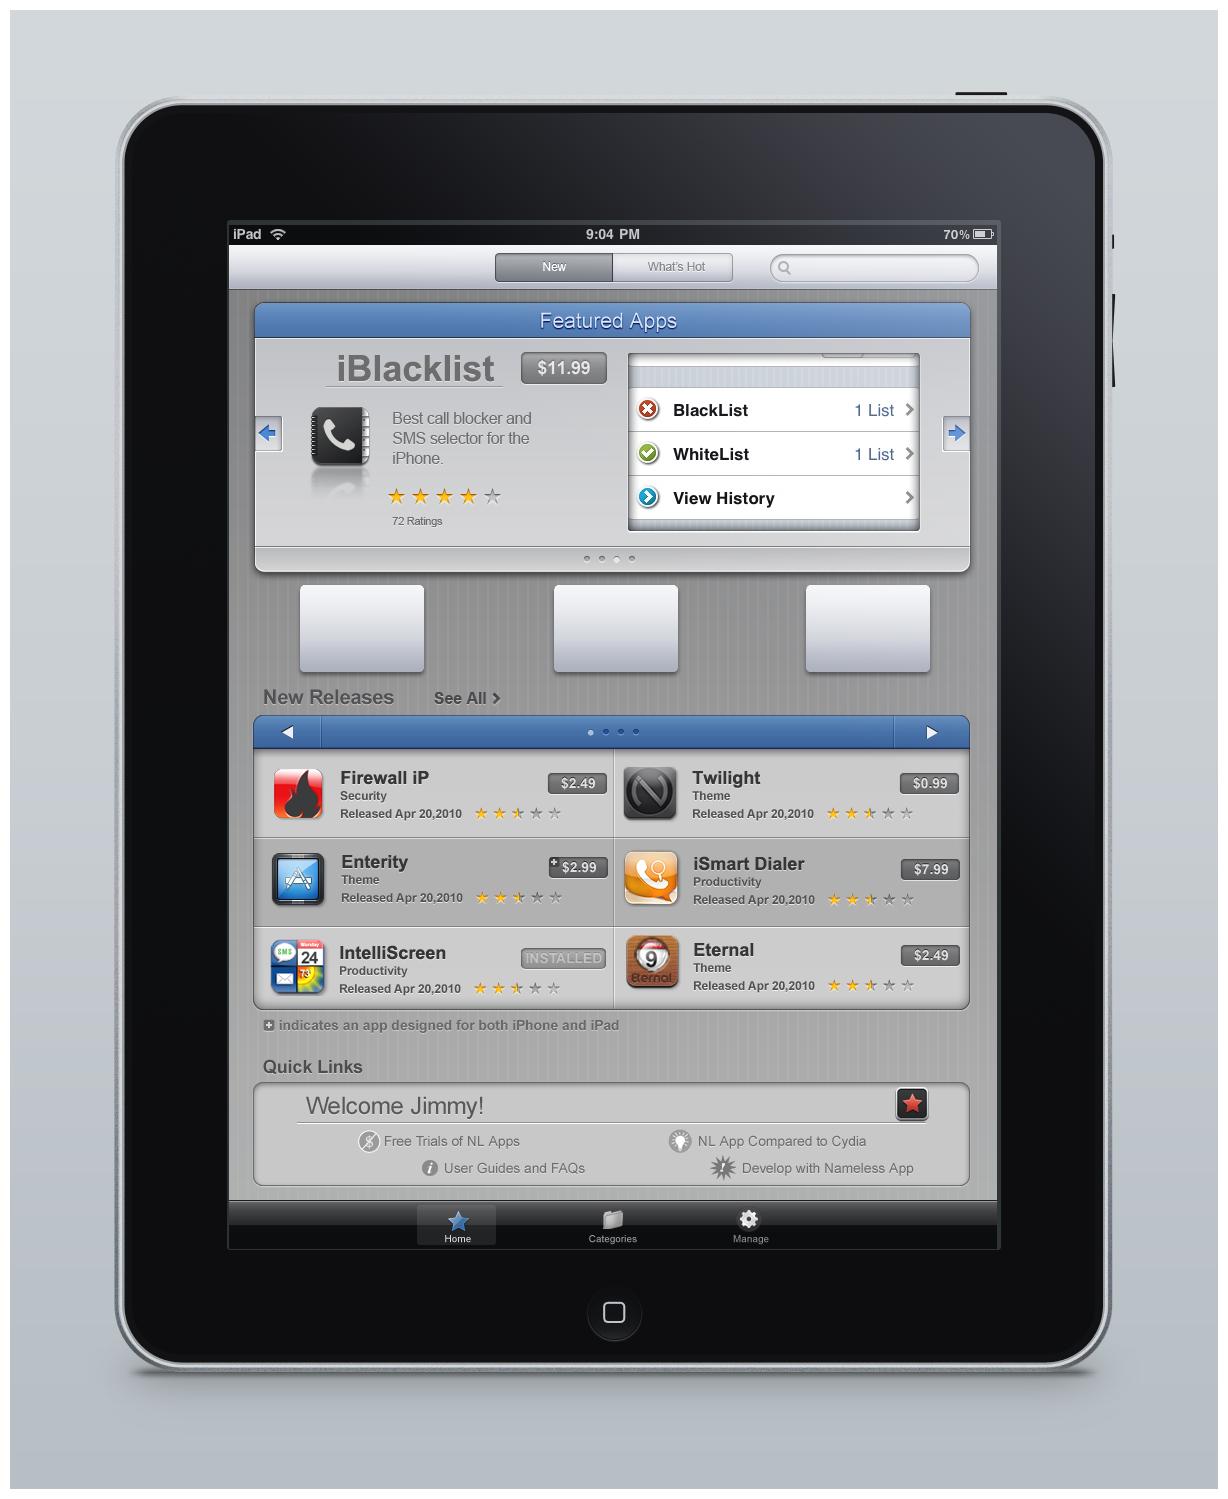 iPad App Psd by montydesi on deviantART